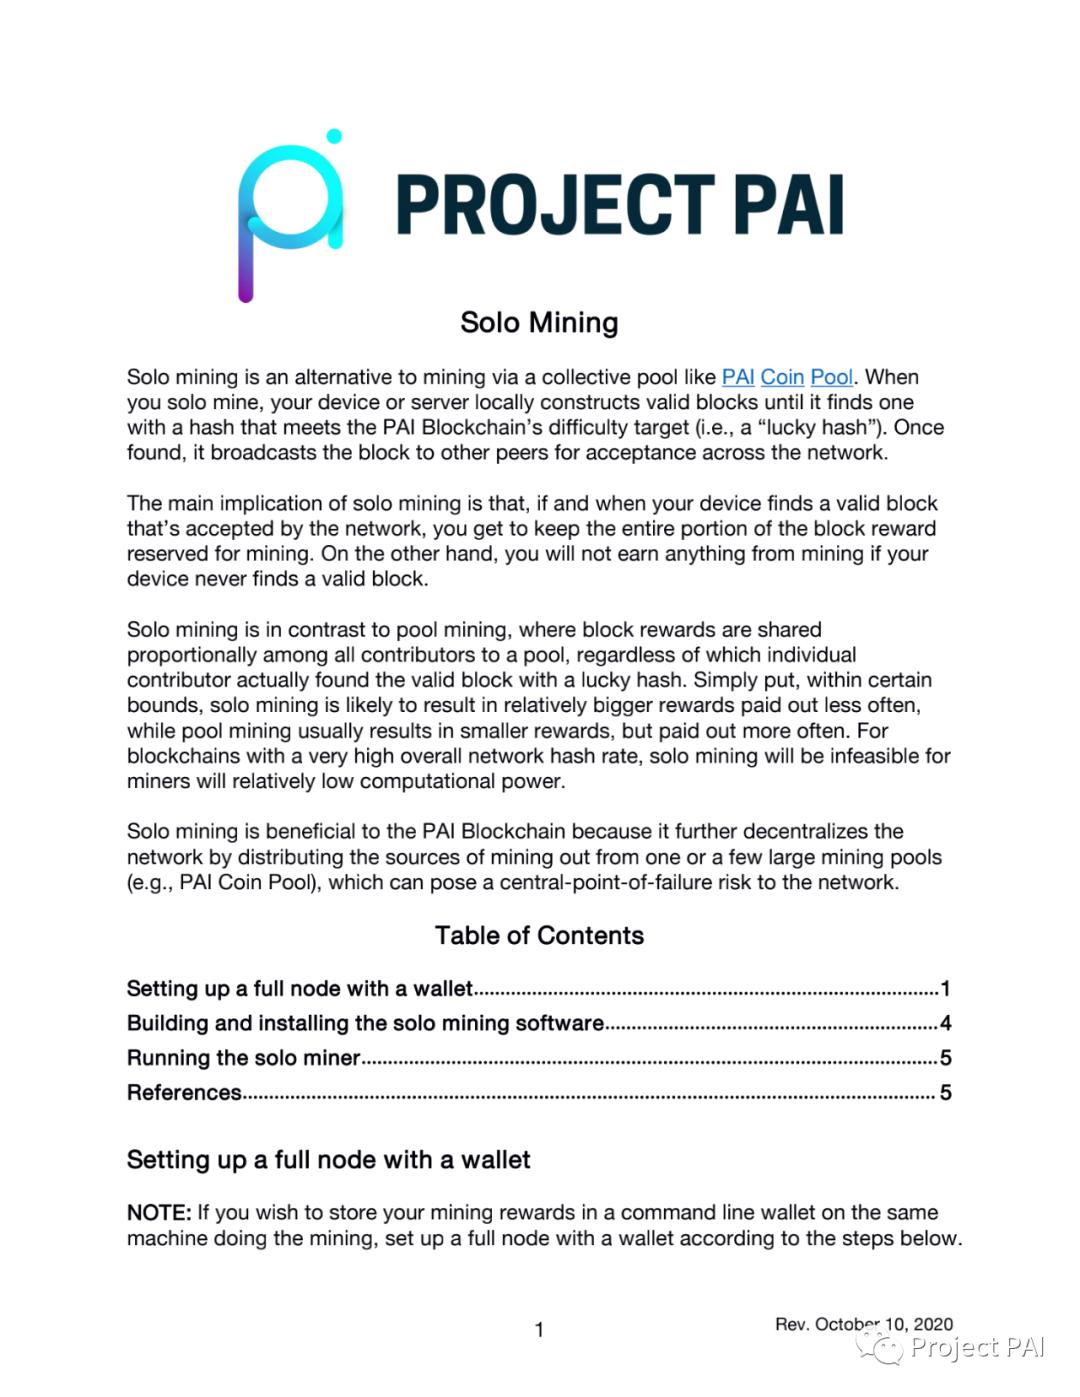 Project PAI独立挖矿教程(最新版)